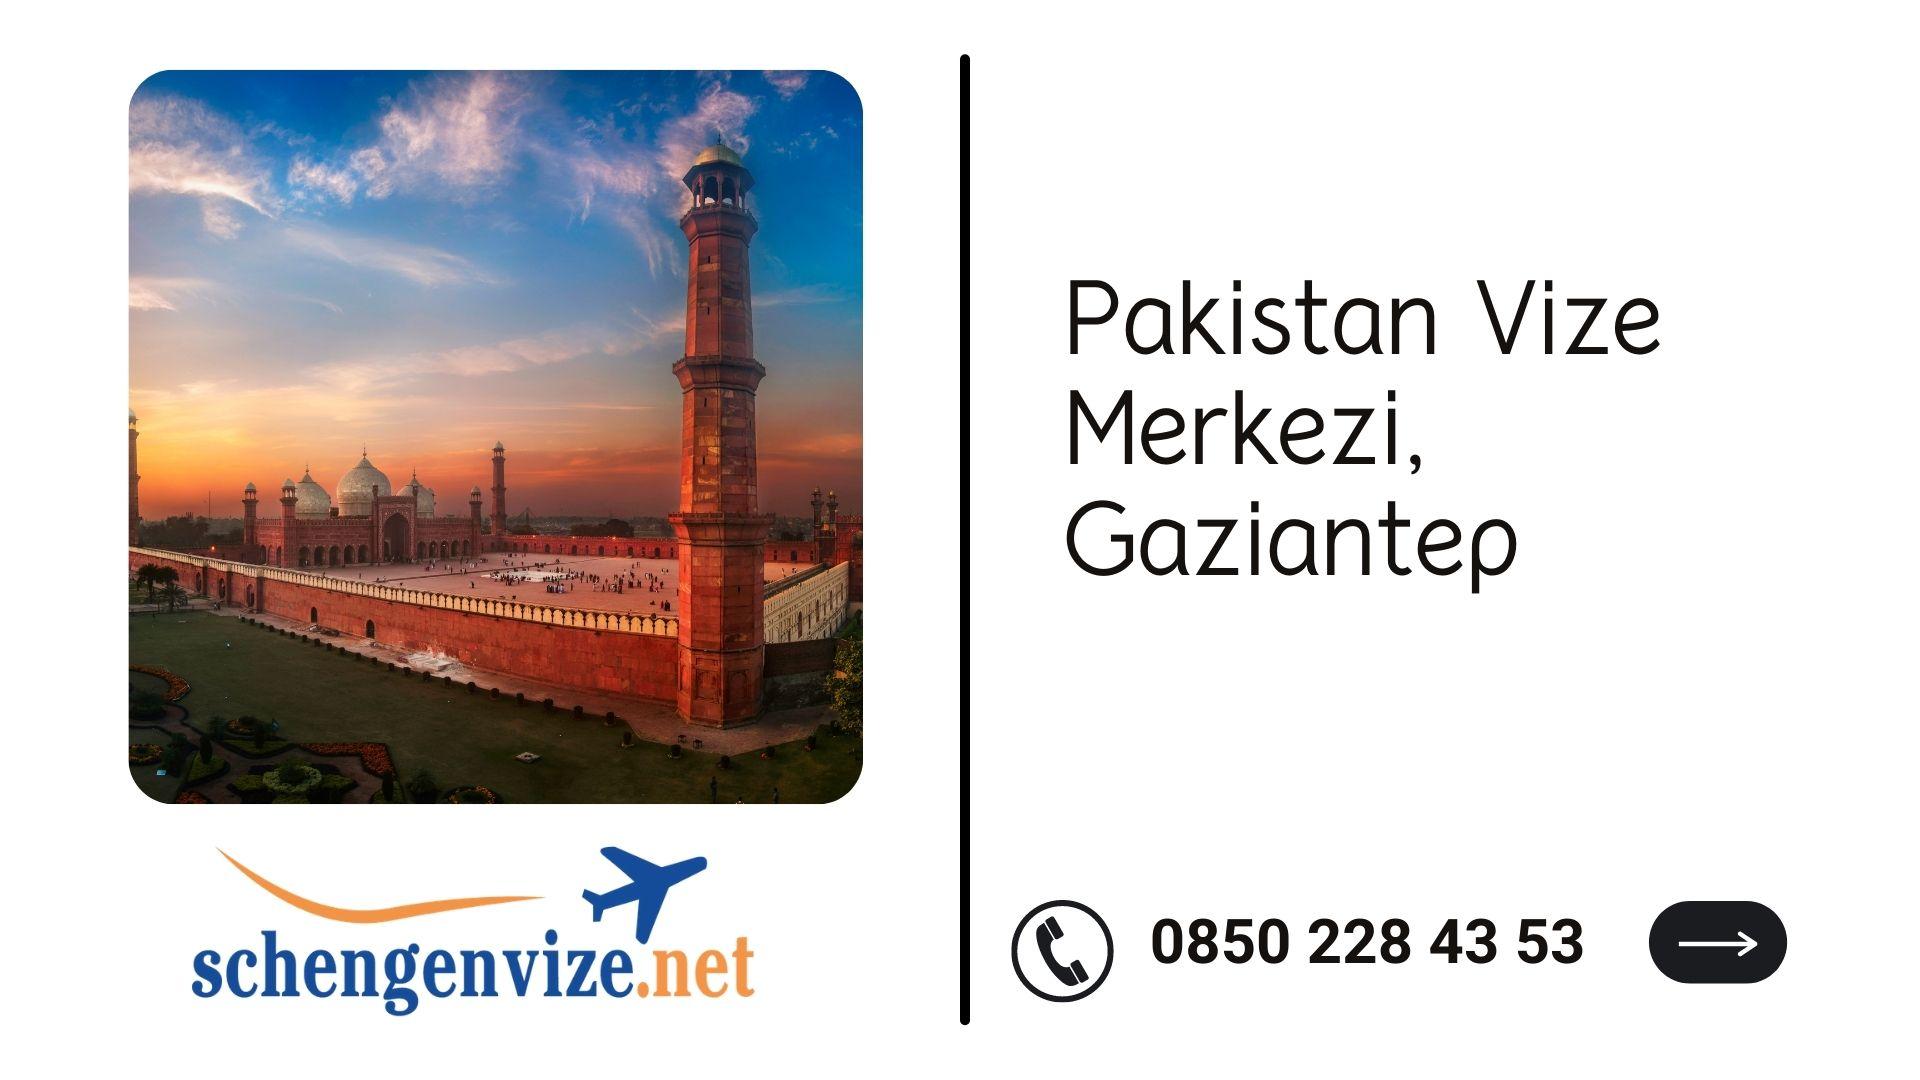 Pakistan Vize Merkezi, Gaziantep